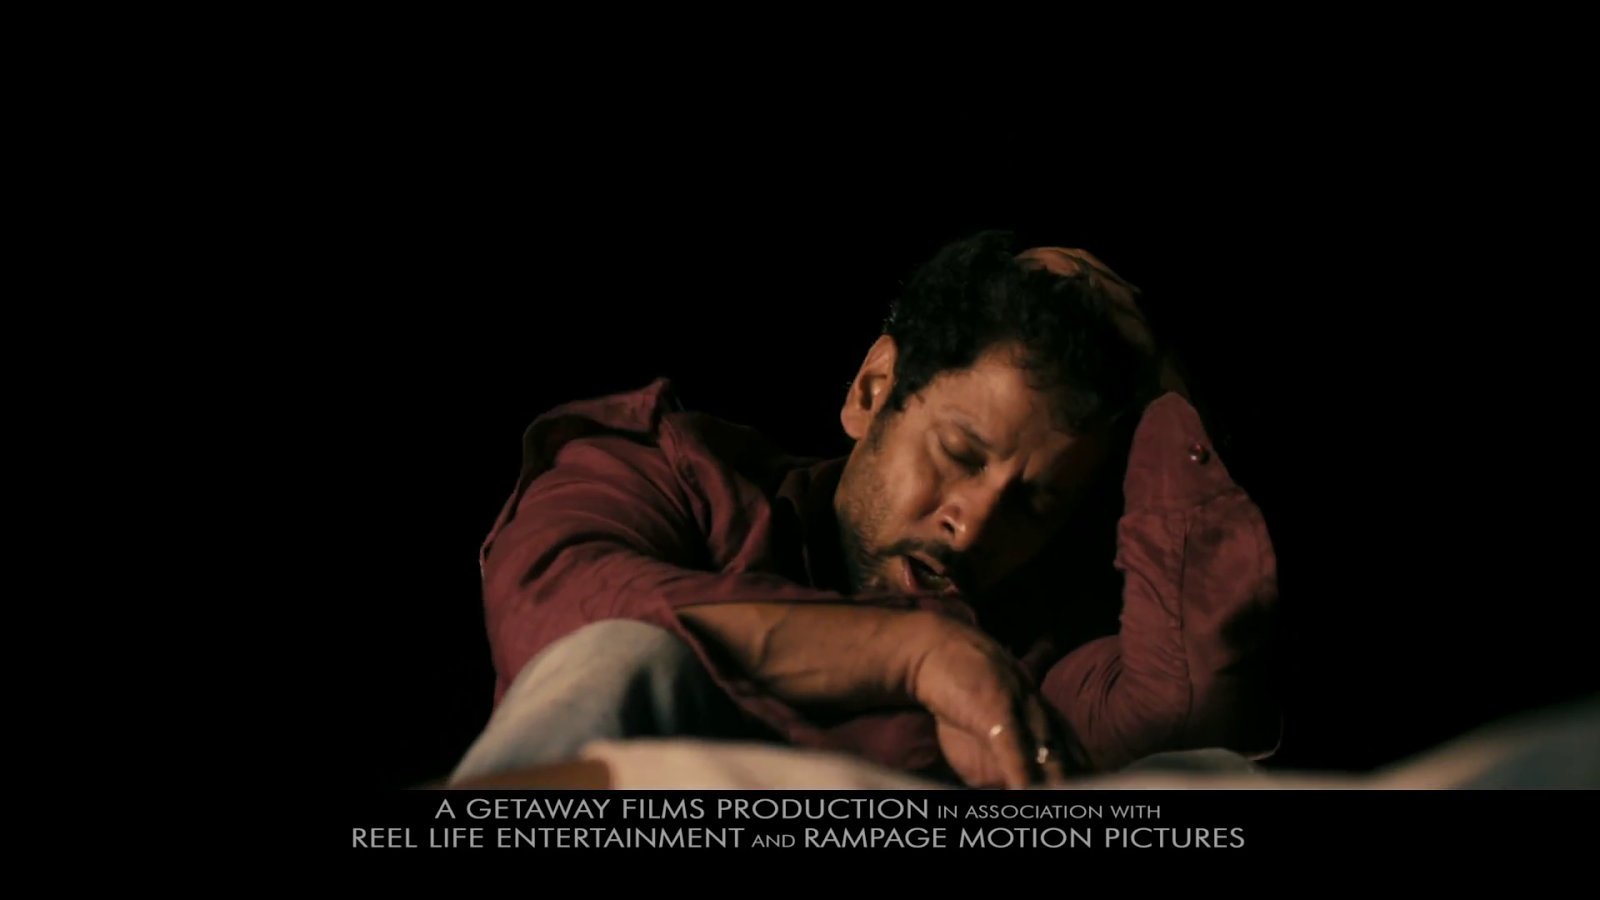 david tamil movie mp3 songs free download zip file